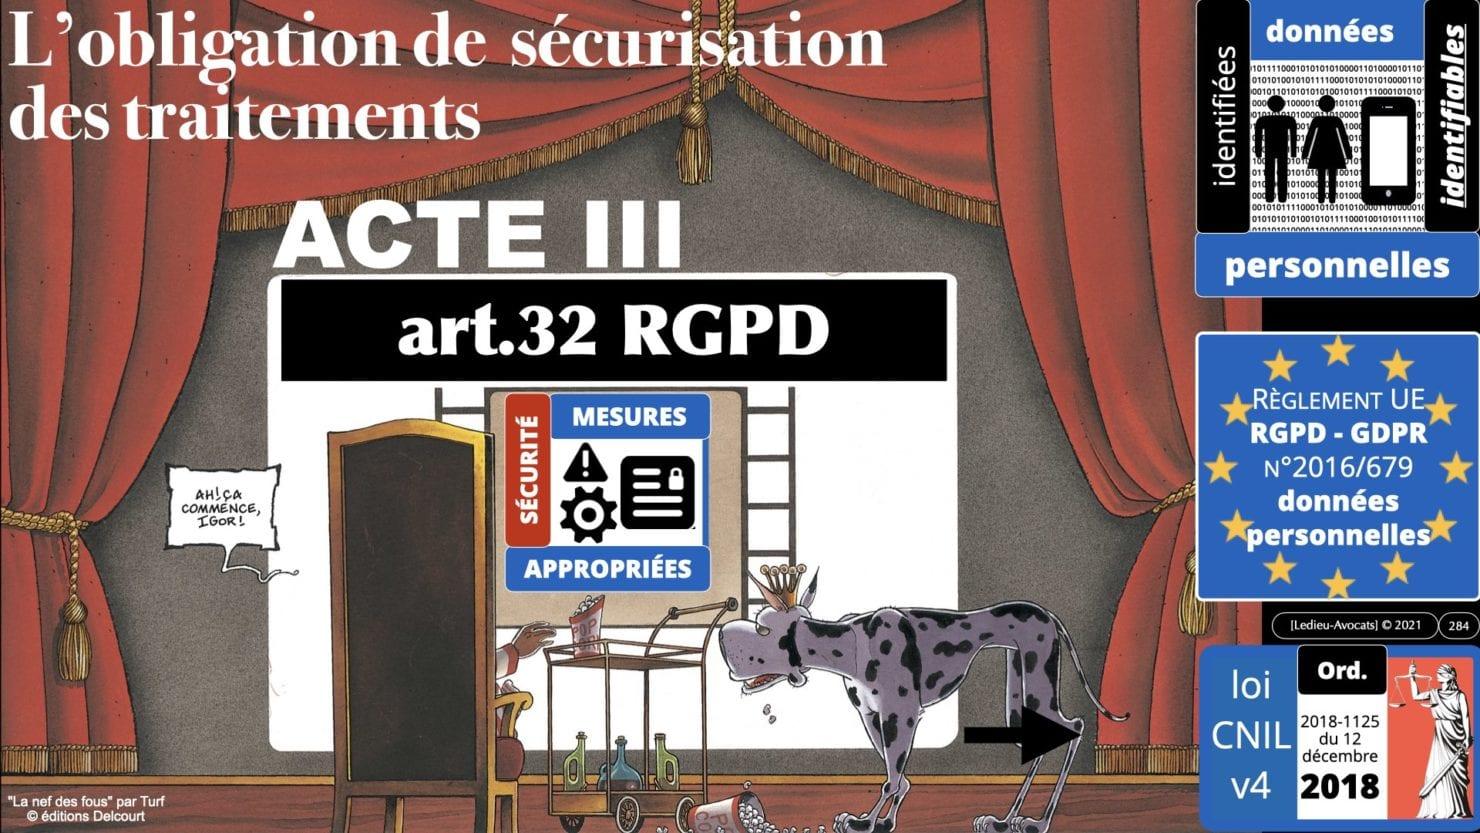 RGPD e-Privacy principes actualité jurisprudence ©Ledieu-Avocats 25-06-2021.284